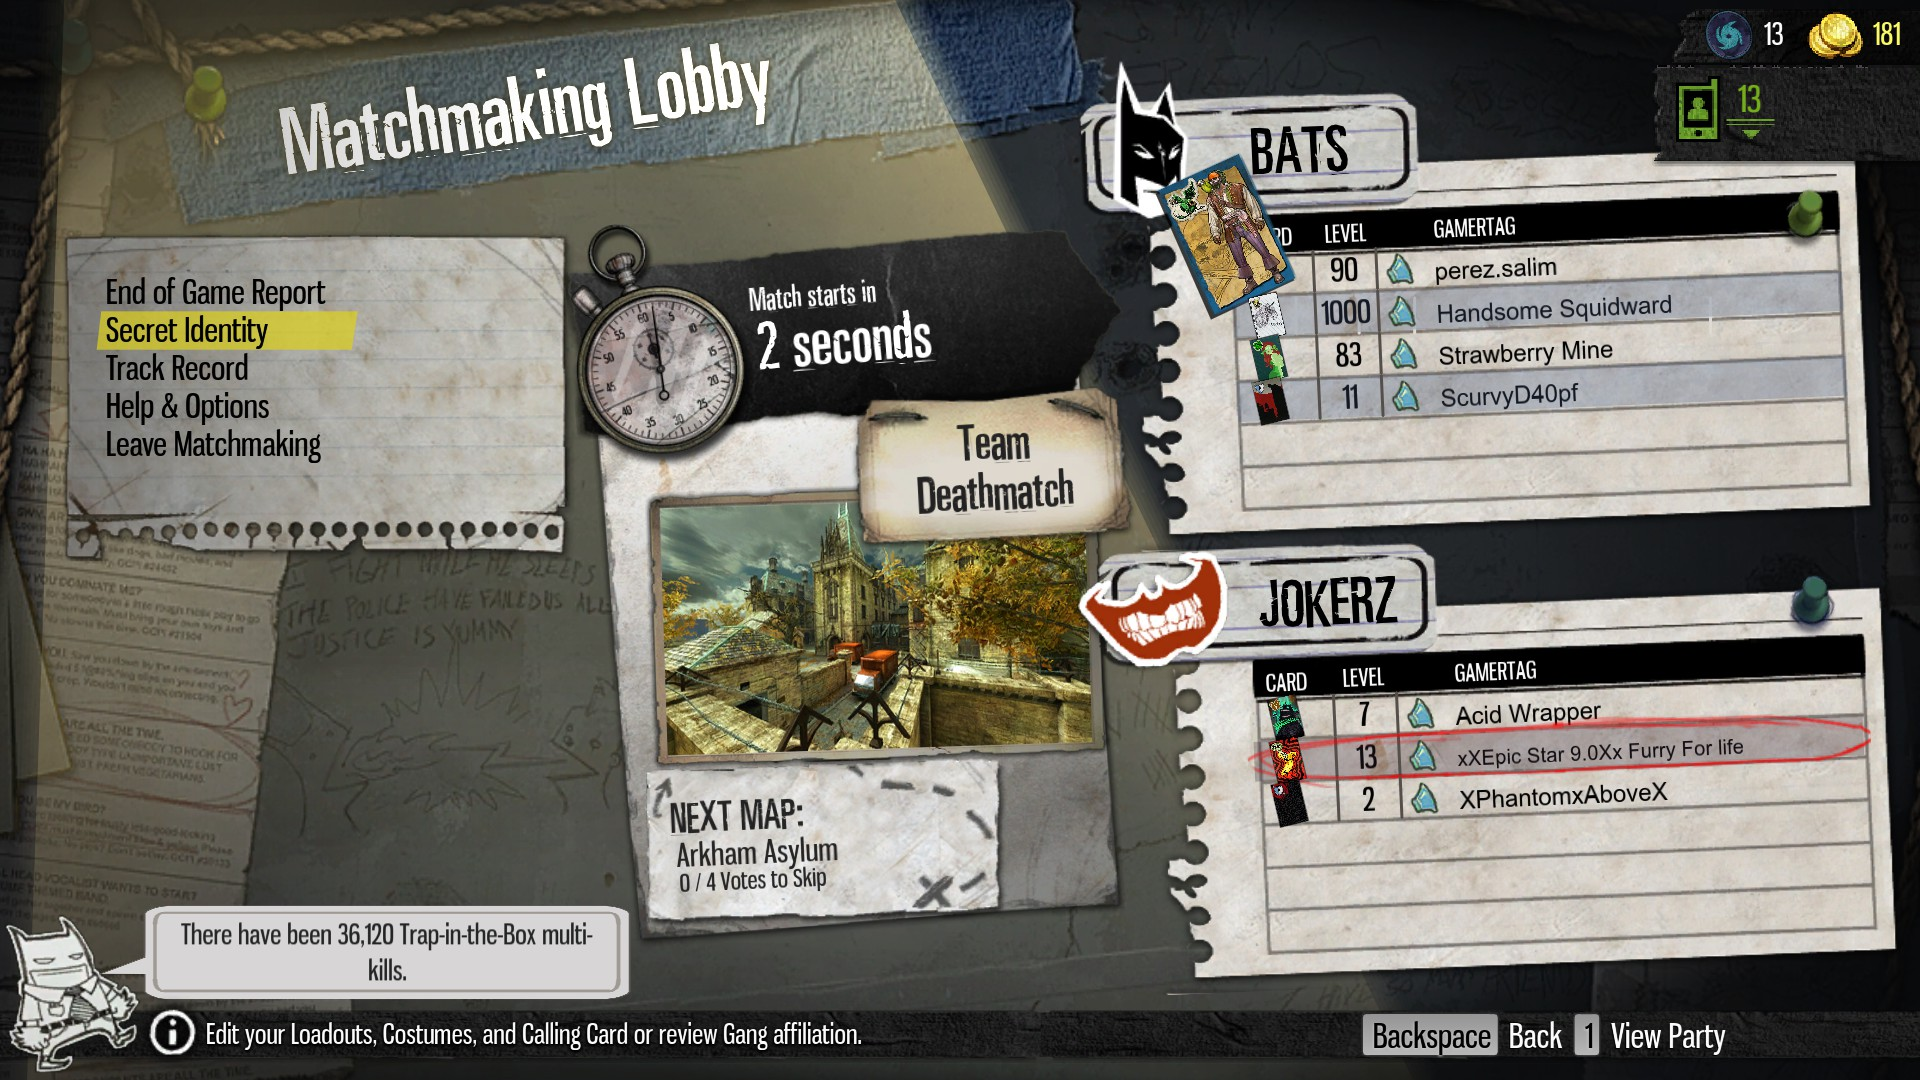 REBEKAH: Gotham city impostors matchmaking takes forever